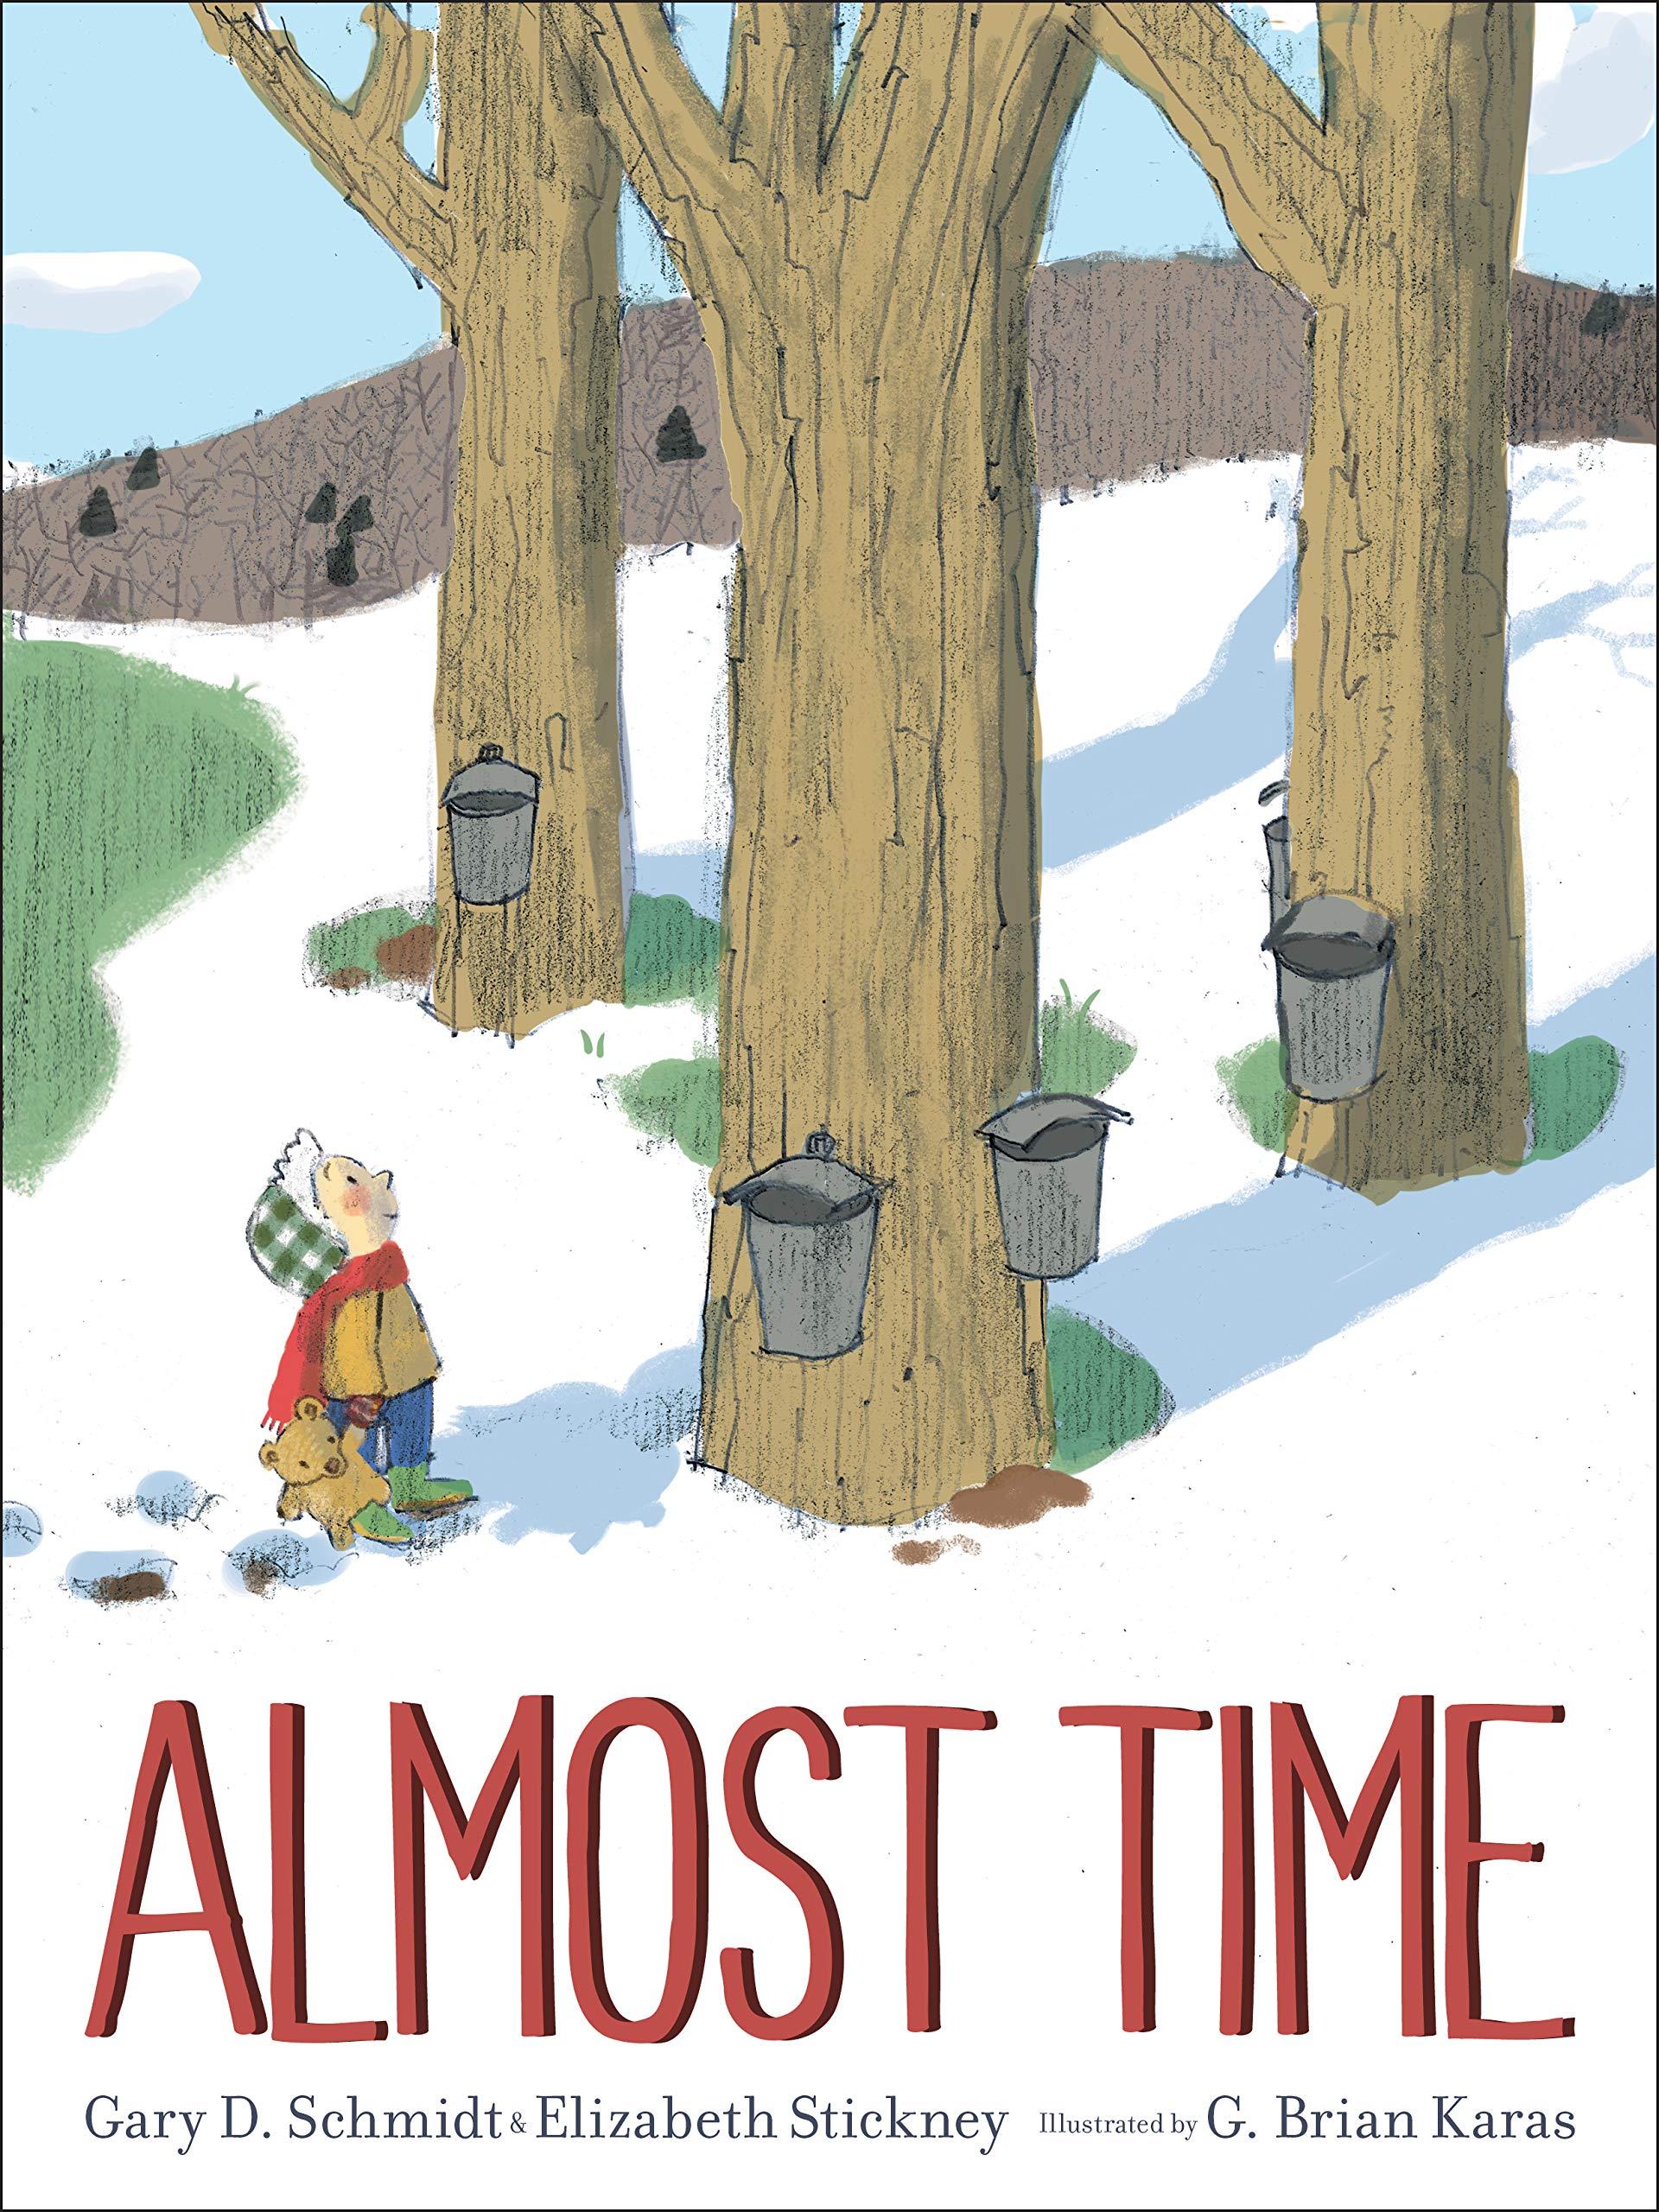 Amazon.com: Almost Time (9780544785816): Schmidt, Gary D., Stickney,  Elizabeth, Karas, Mr. G. Brian: Books